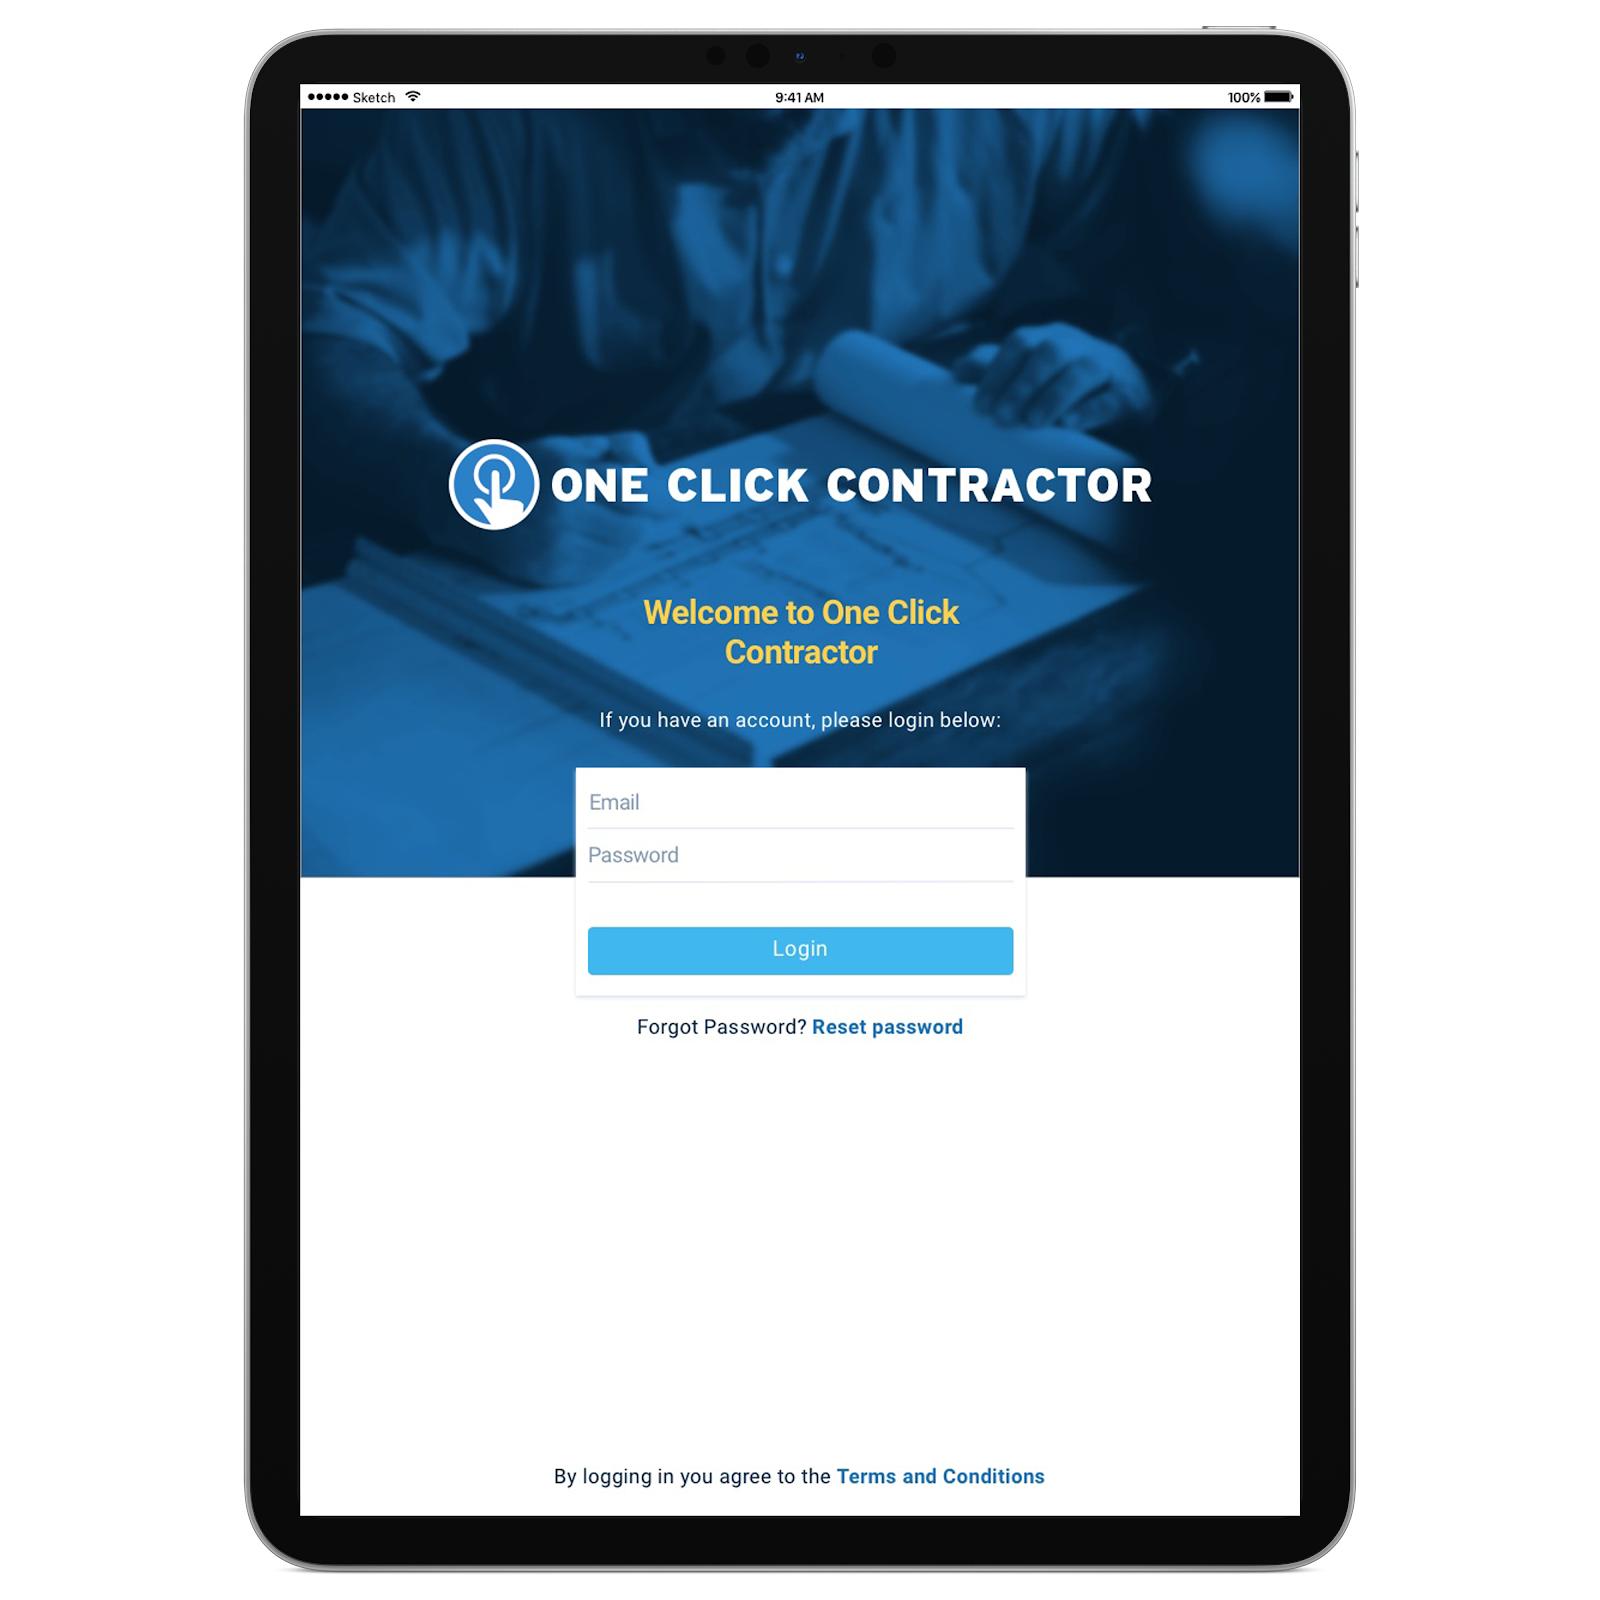 One Click Contractor App